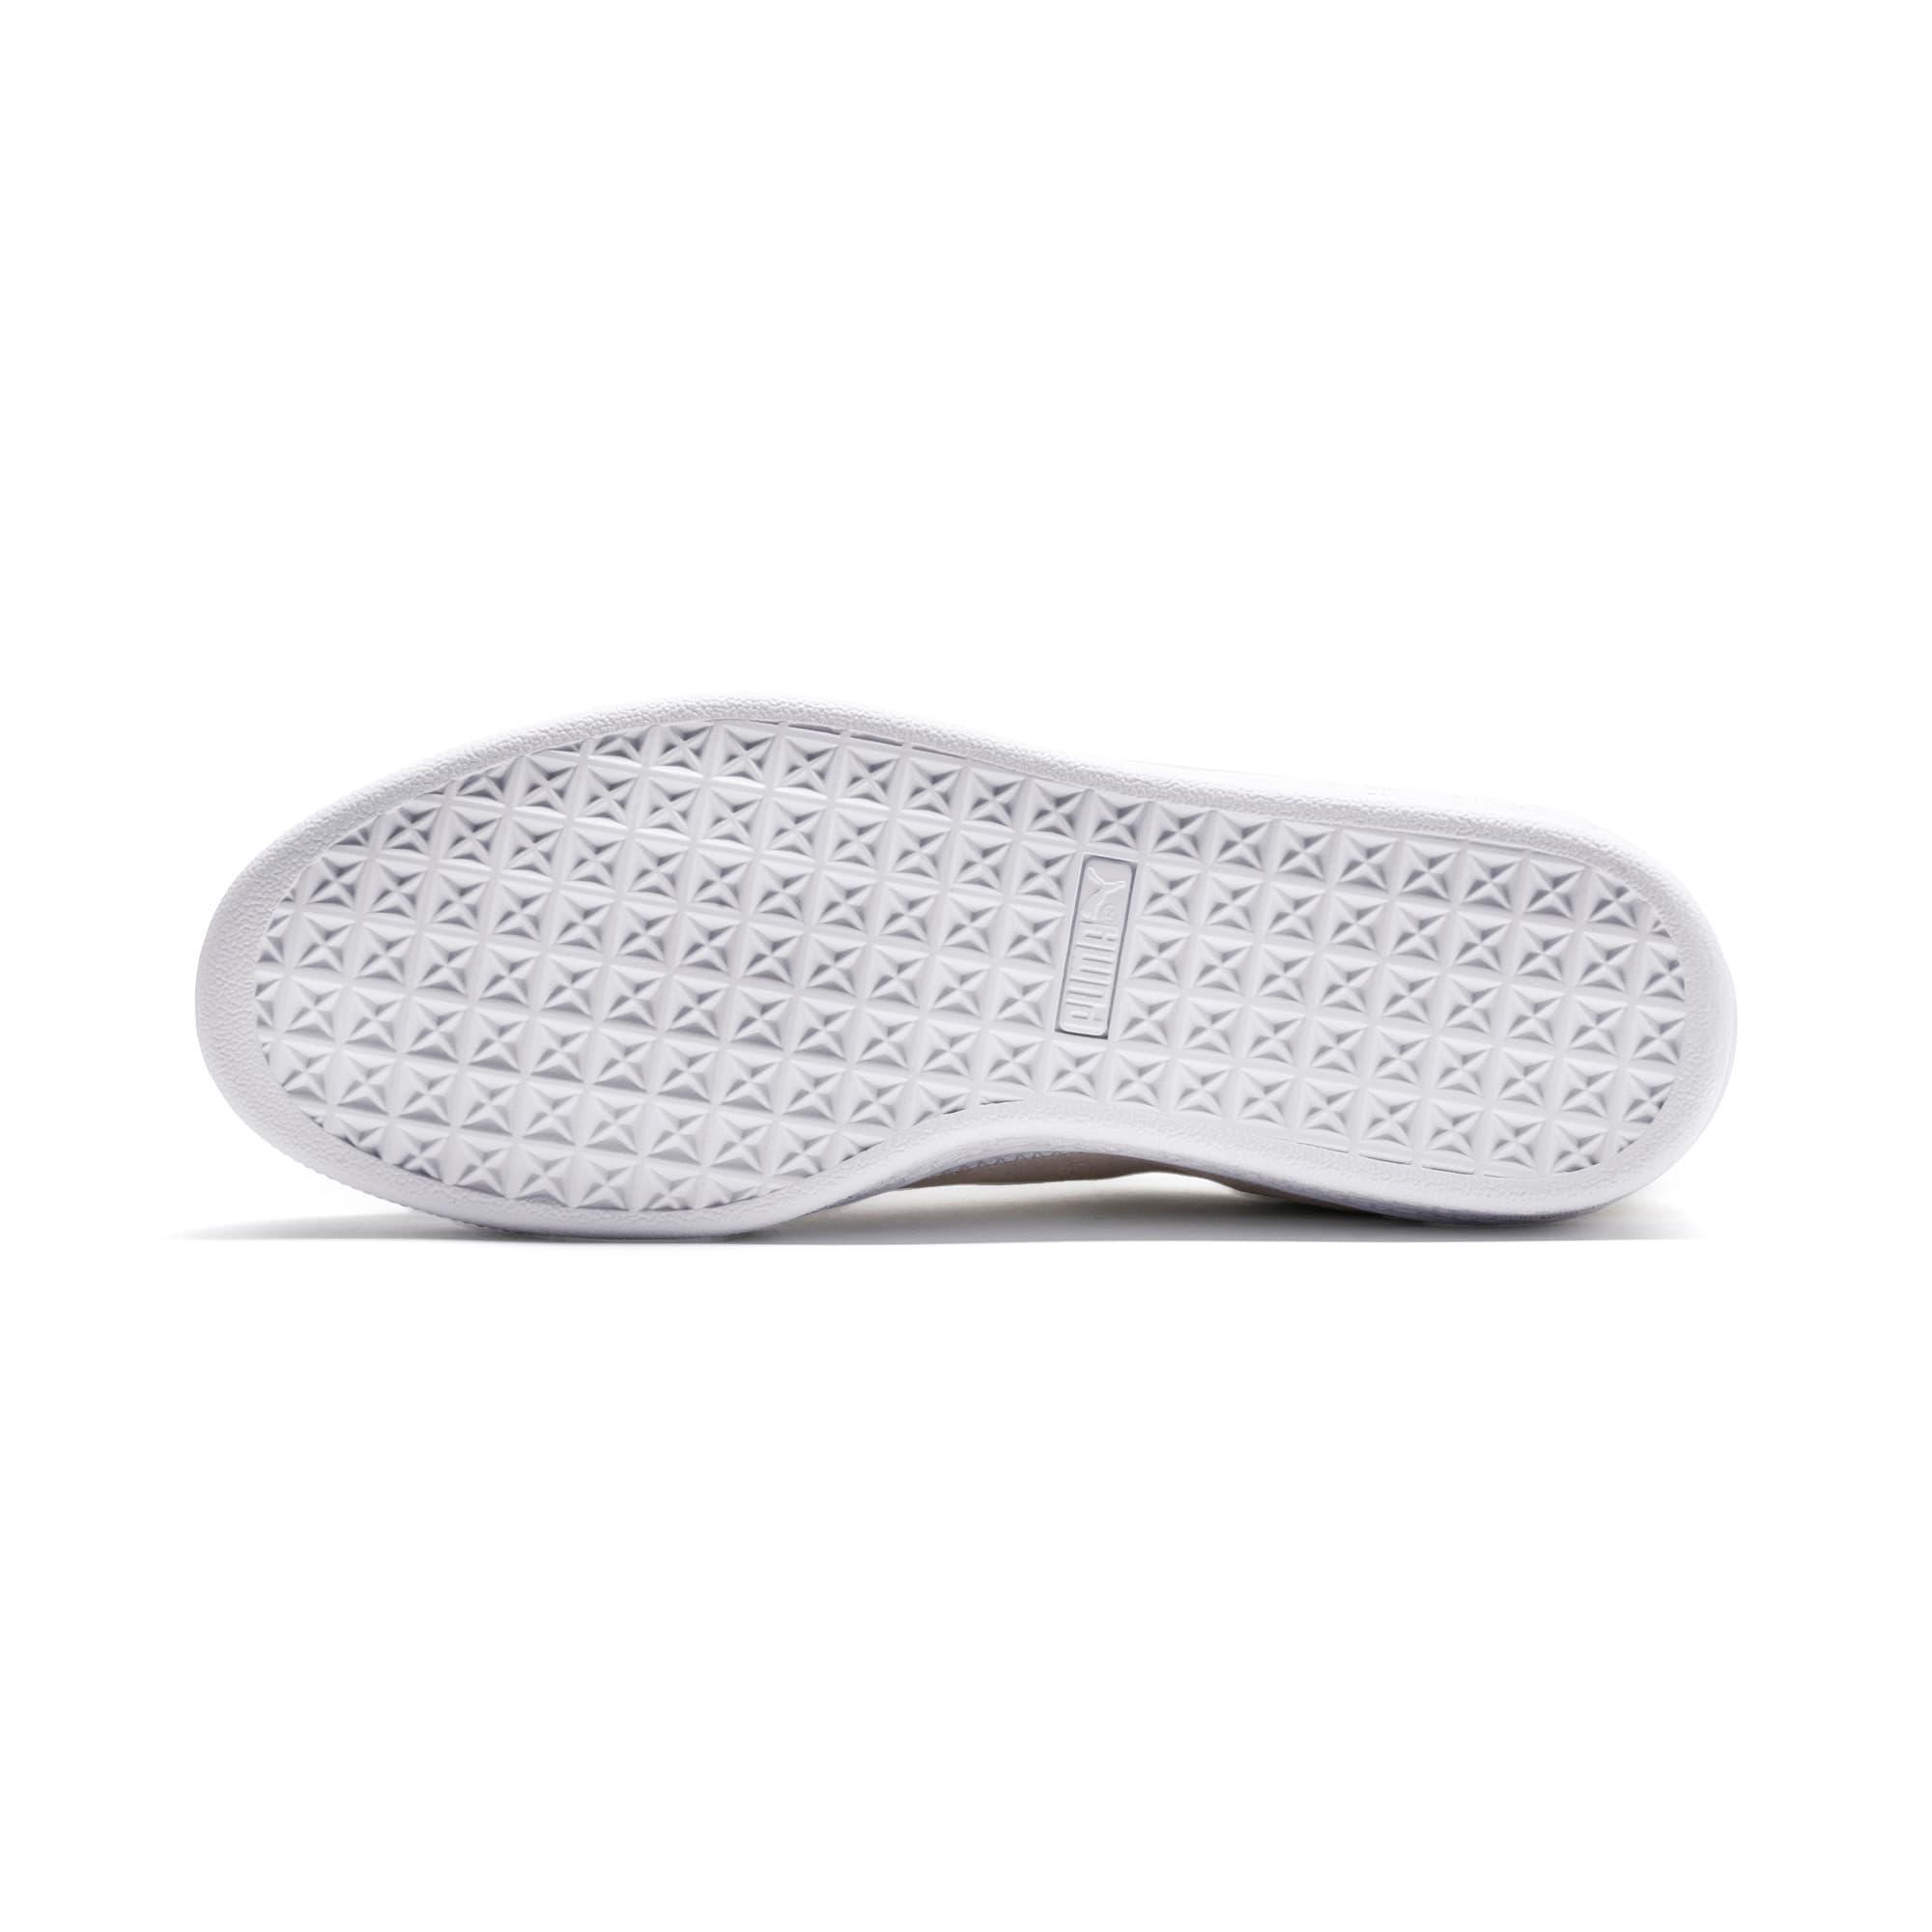 Thumbnail 5 of Suede Trim Sneaker, Whisper White-White- Gold, medium